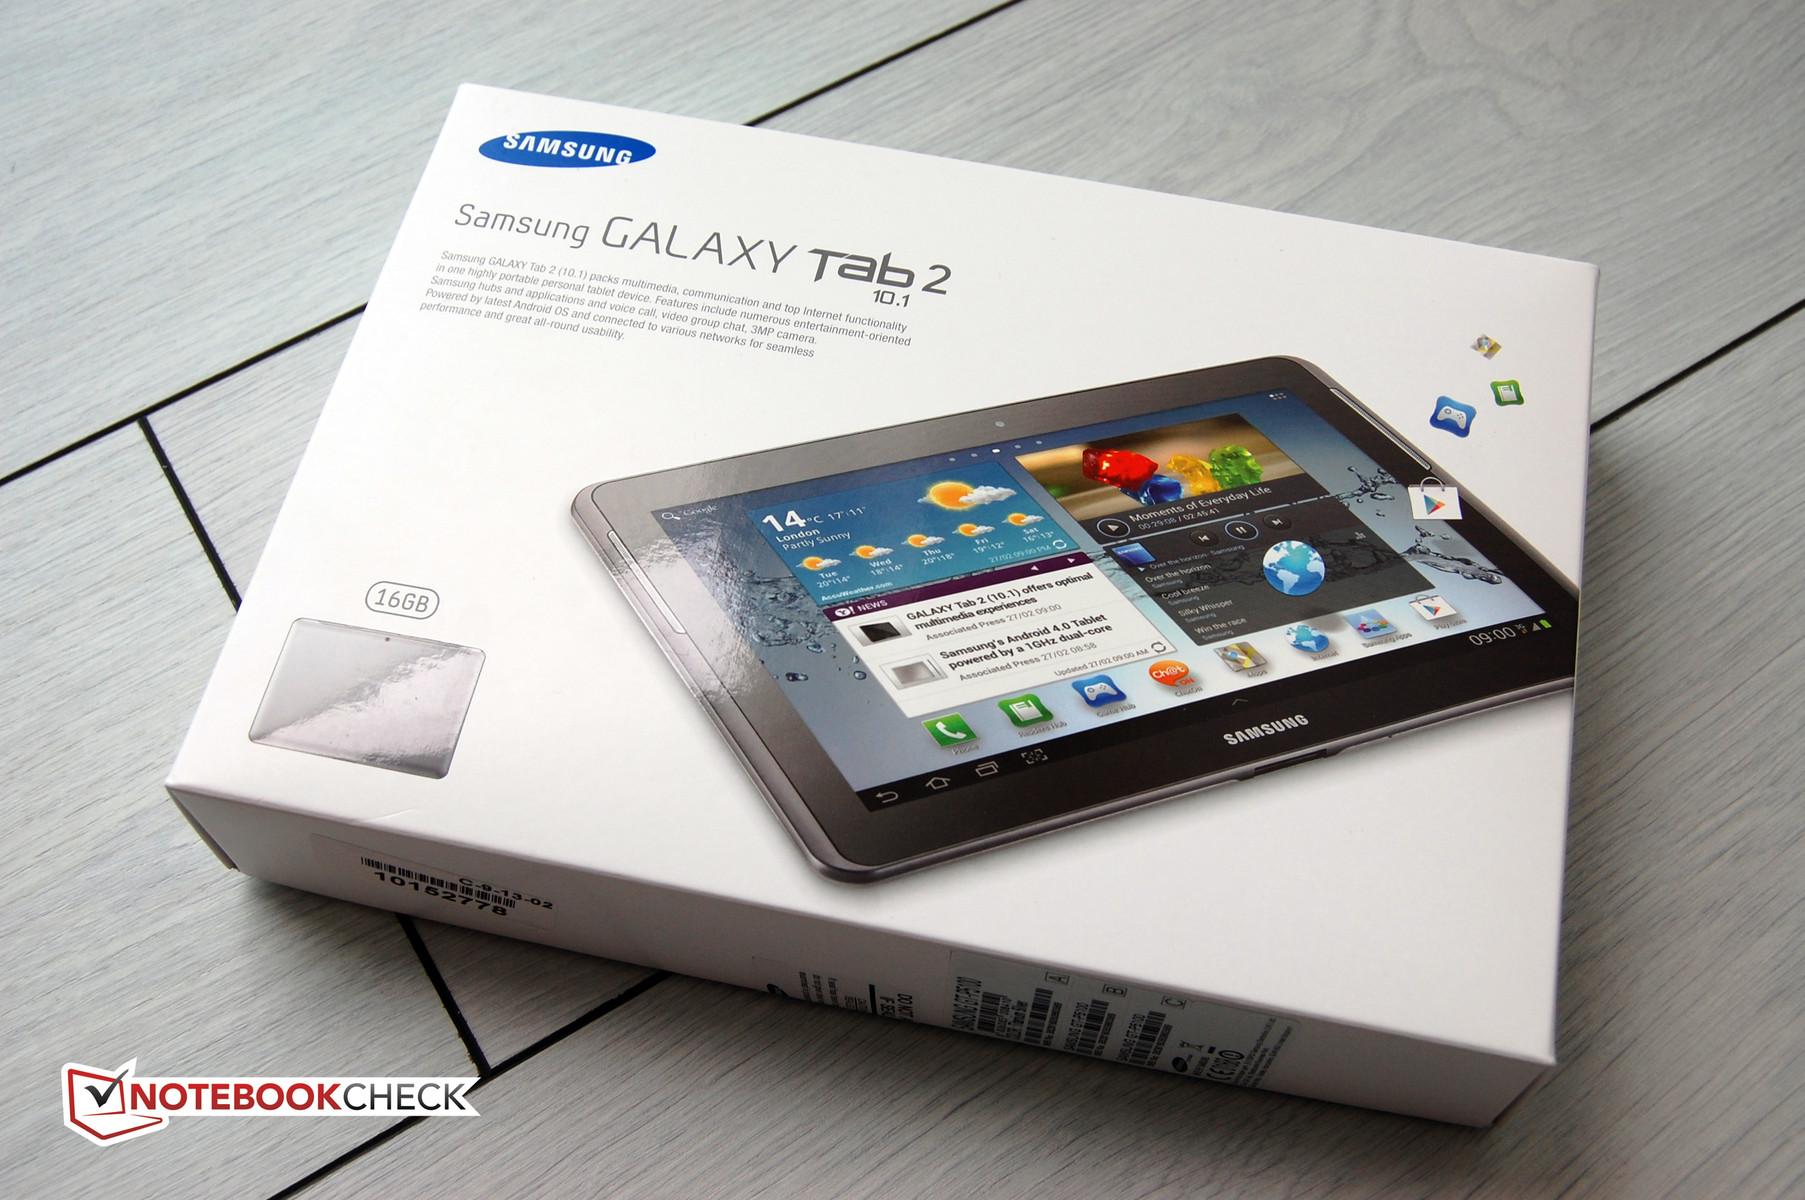 test samsung galaxy tab 2 10 1 tablet mid notebookcheck. Black Bedroom Furniture Sets. Home Design Ideas